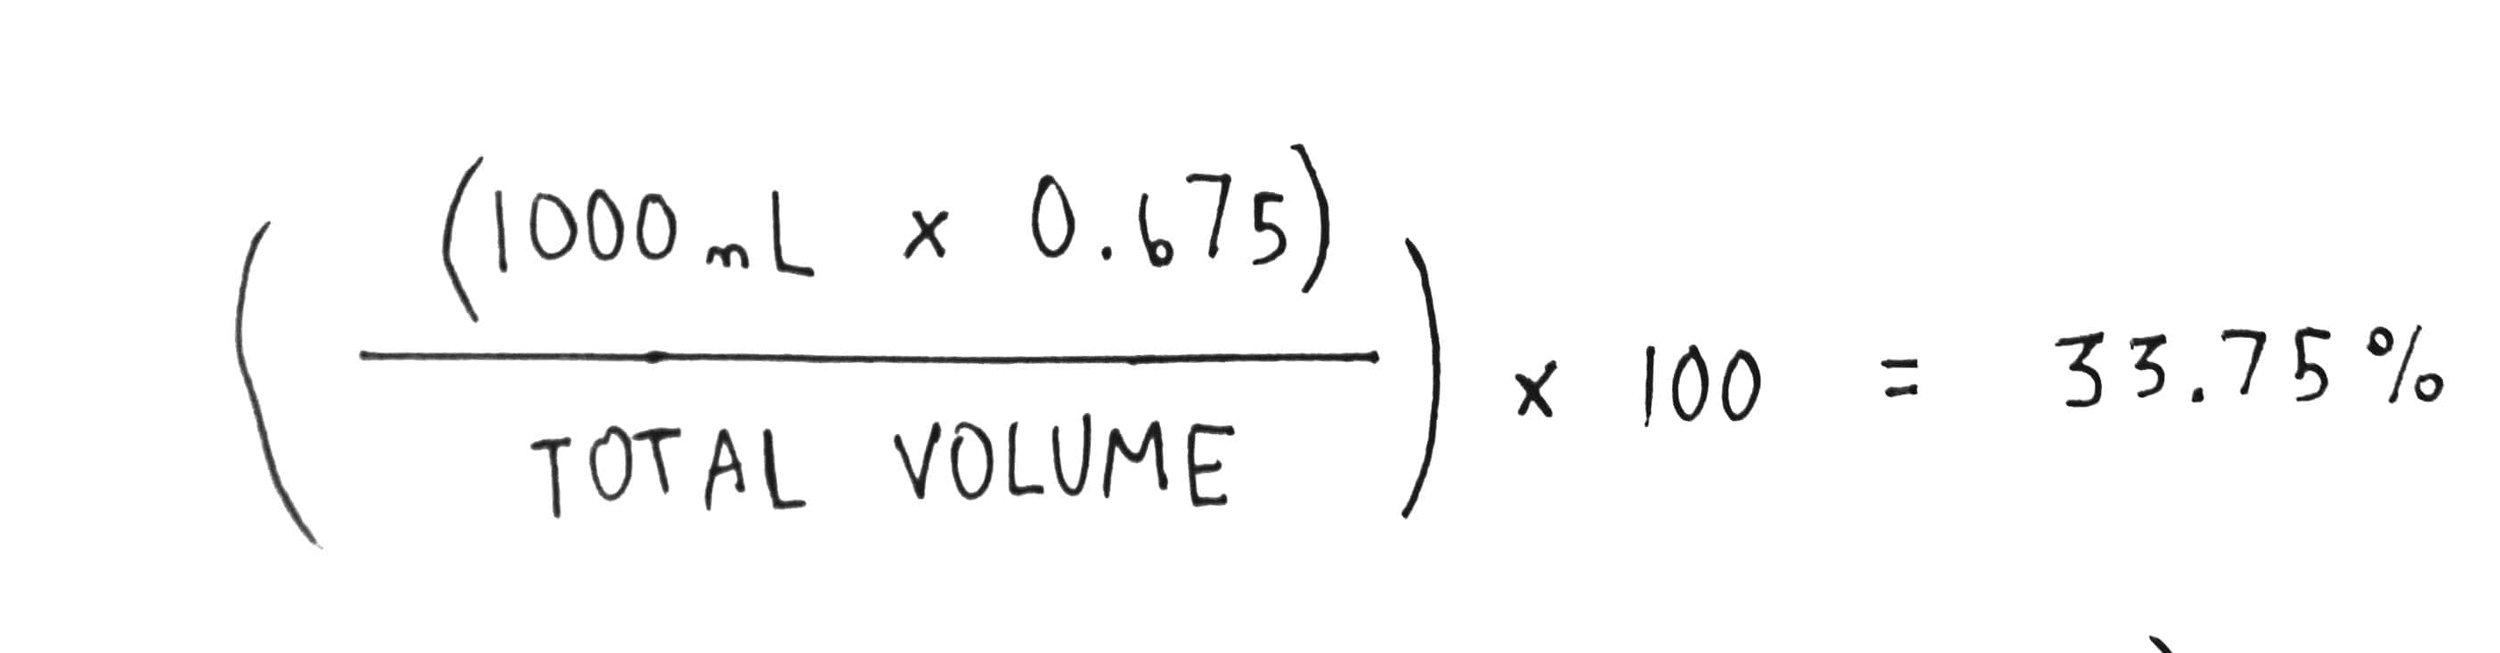 Portland-florist-flower-equation-4